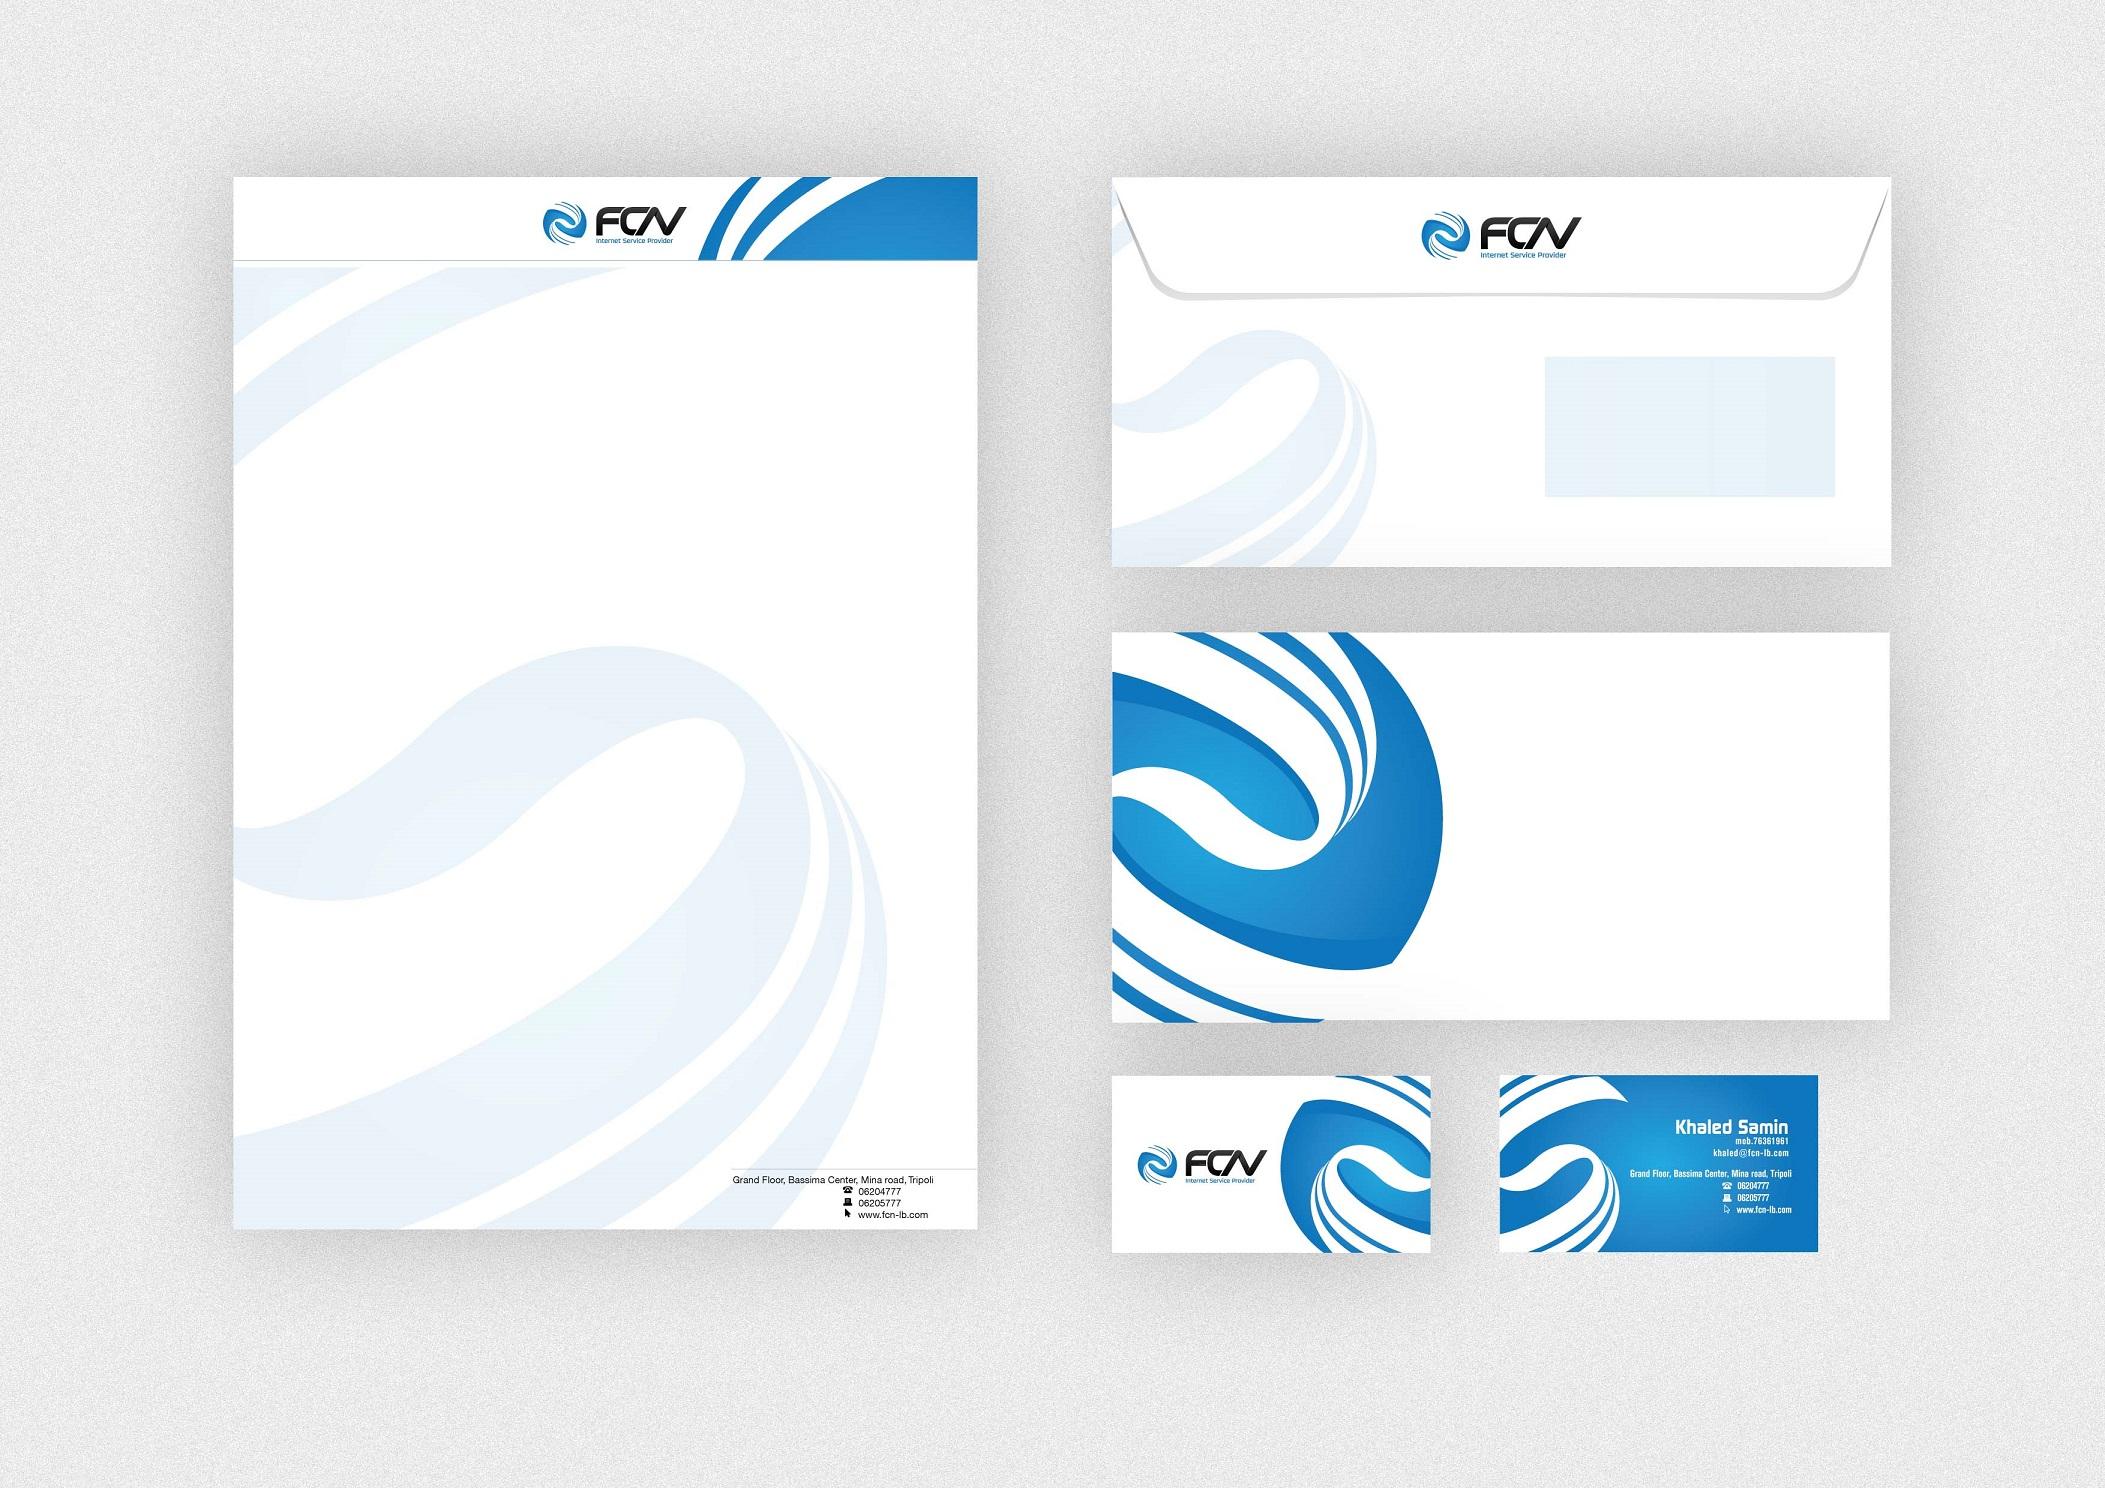 Internet Company Logos   Joy Studio Design Gallery - Best ...